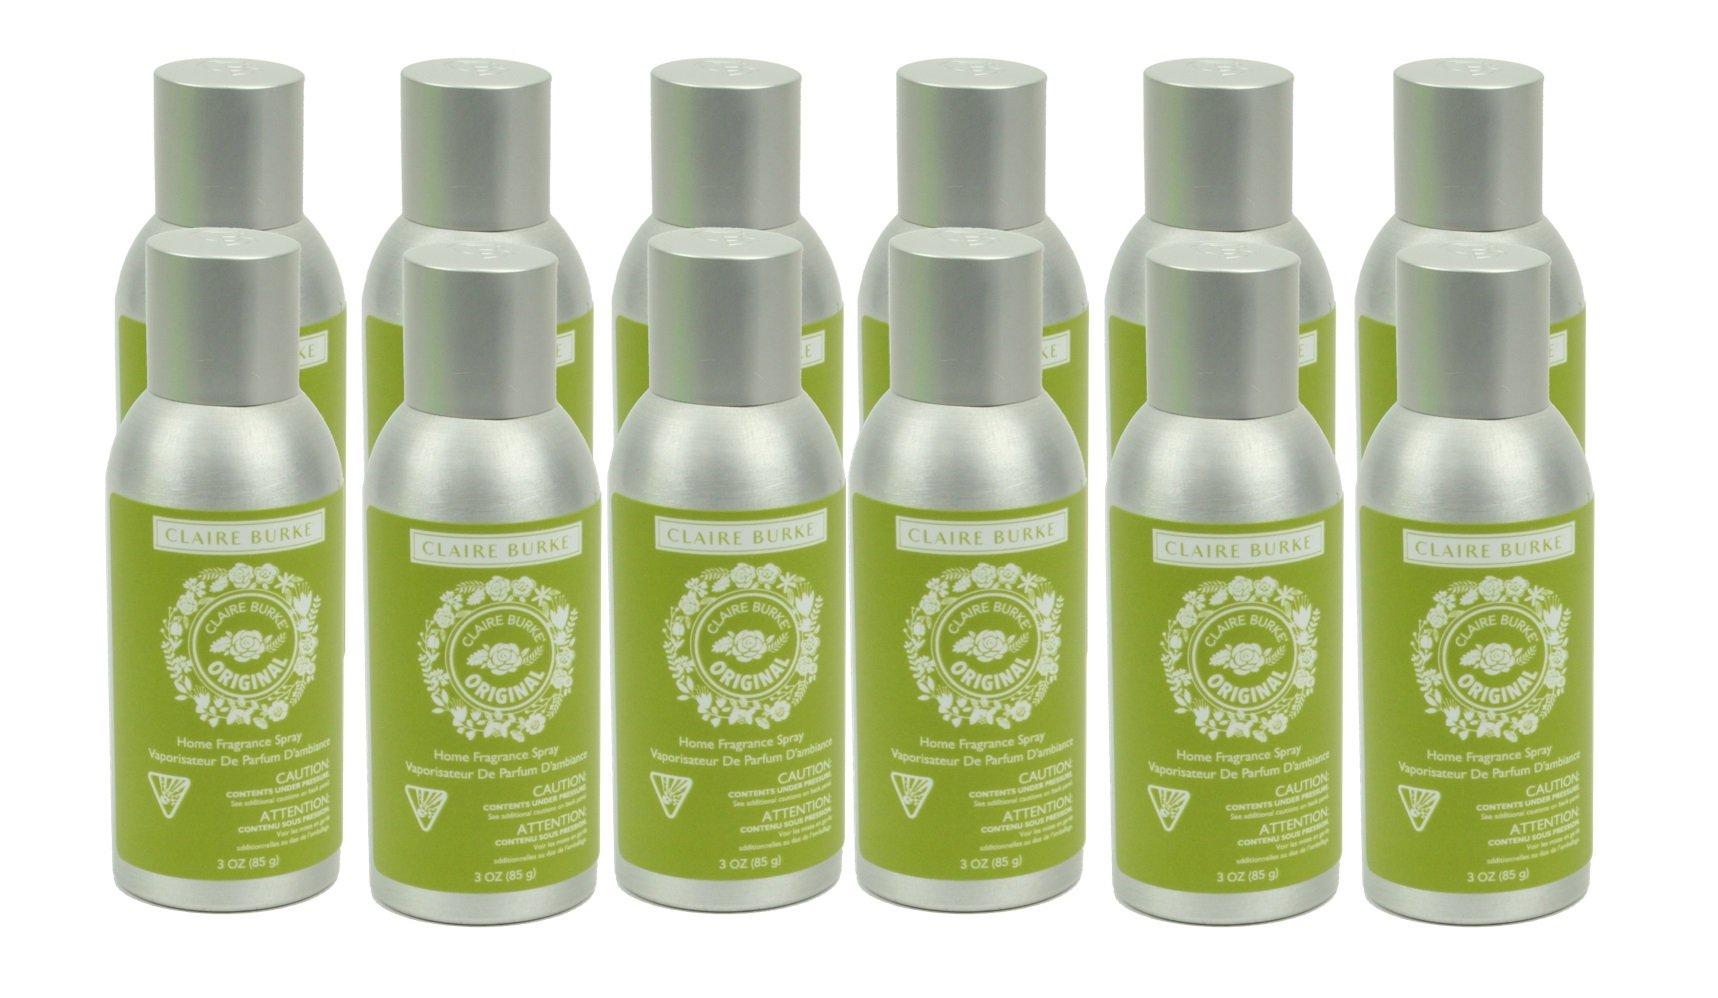 Original Home Fragrance Spray, 3 oz by Claire Burke (12) by Claire Burke